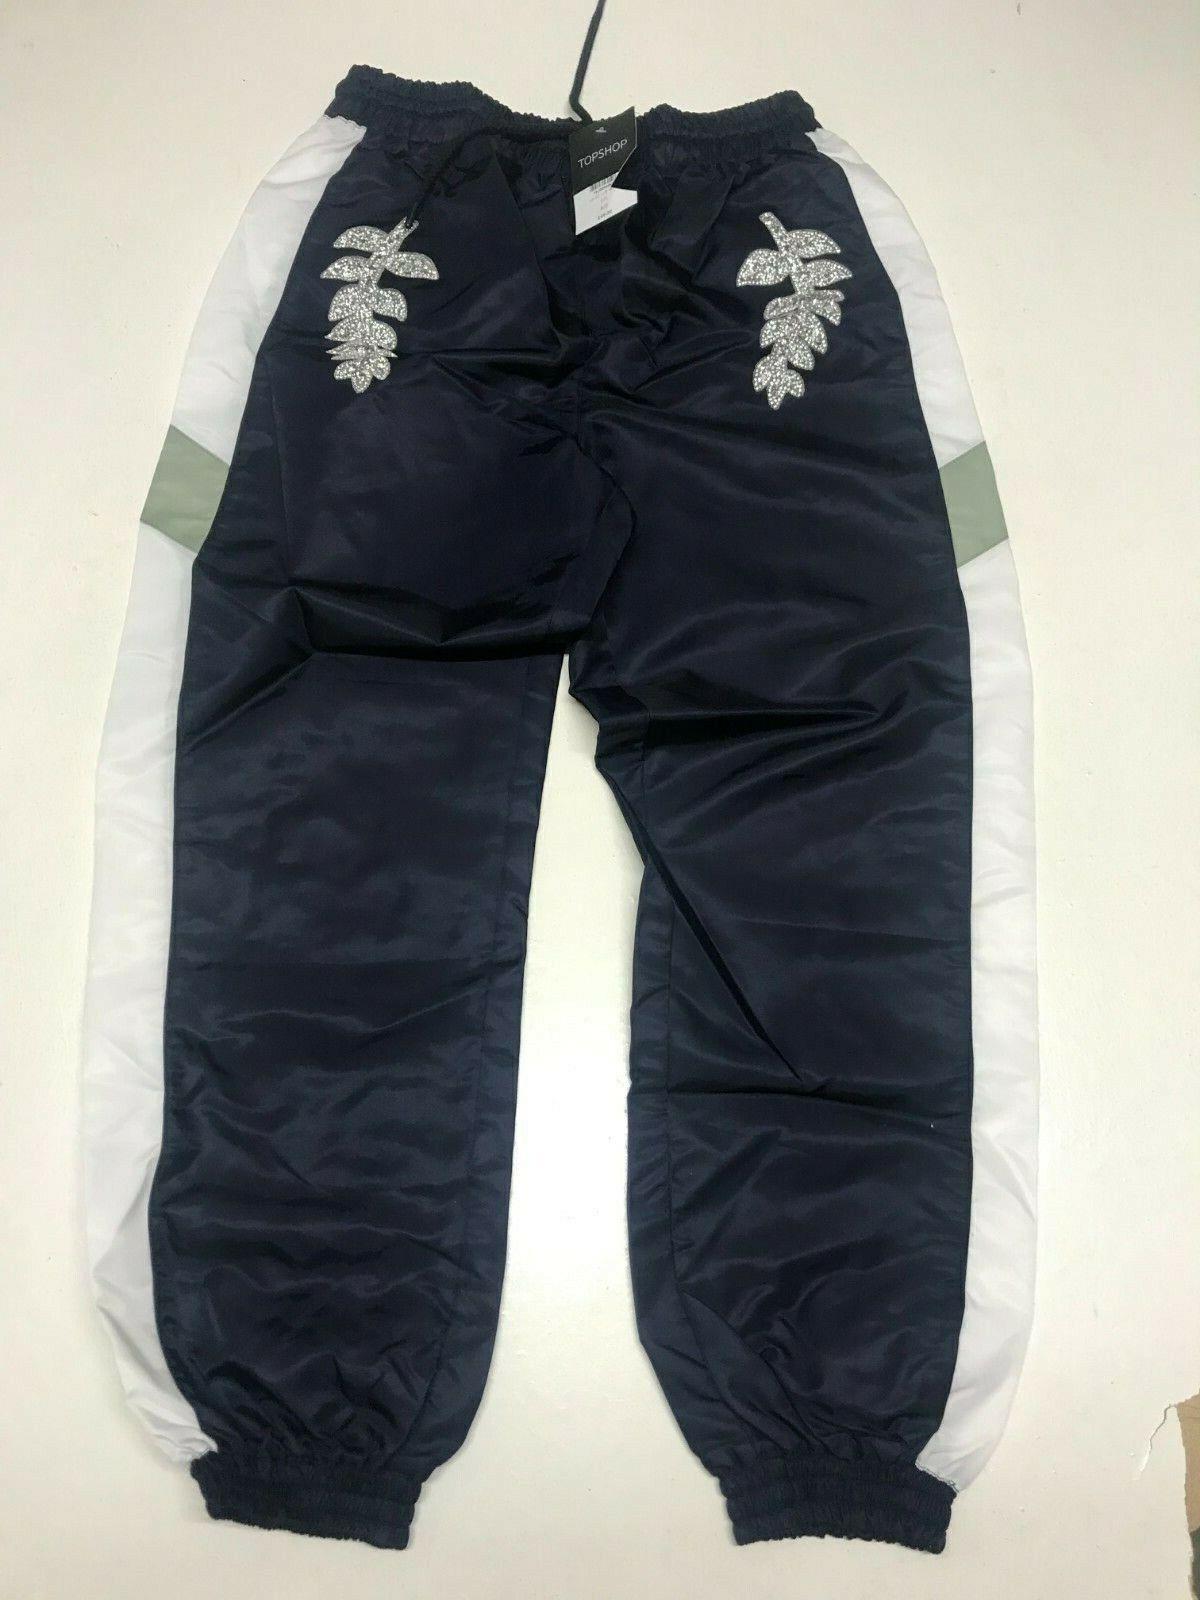 Ex TopShop Marineblau Jogginghose mit Verschönert Detail UK 12 L27 (TS57-9)